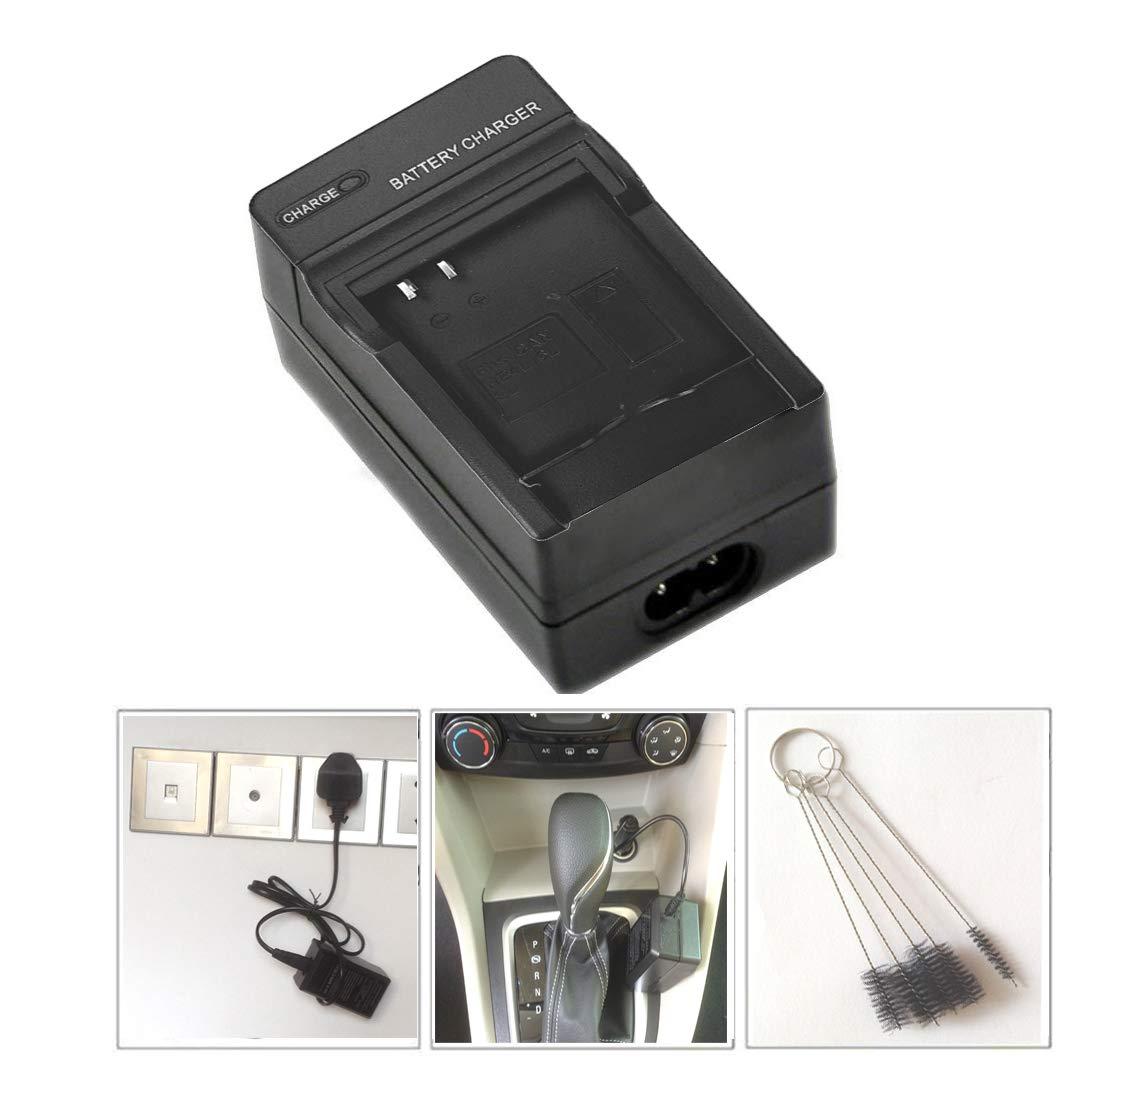 Accessories Camera & Photo gaixample.org New NB-4L Camera Battery ...